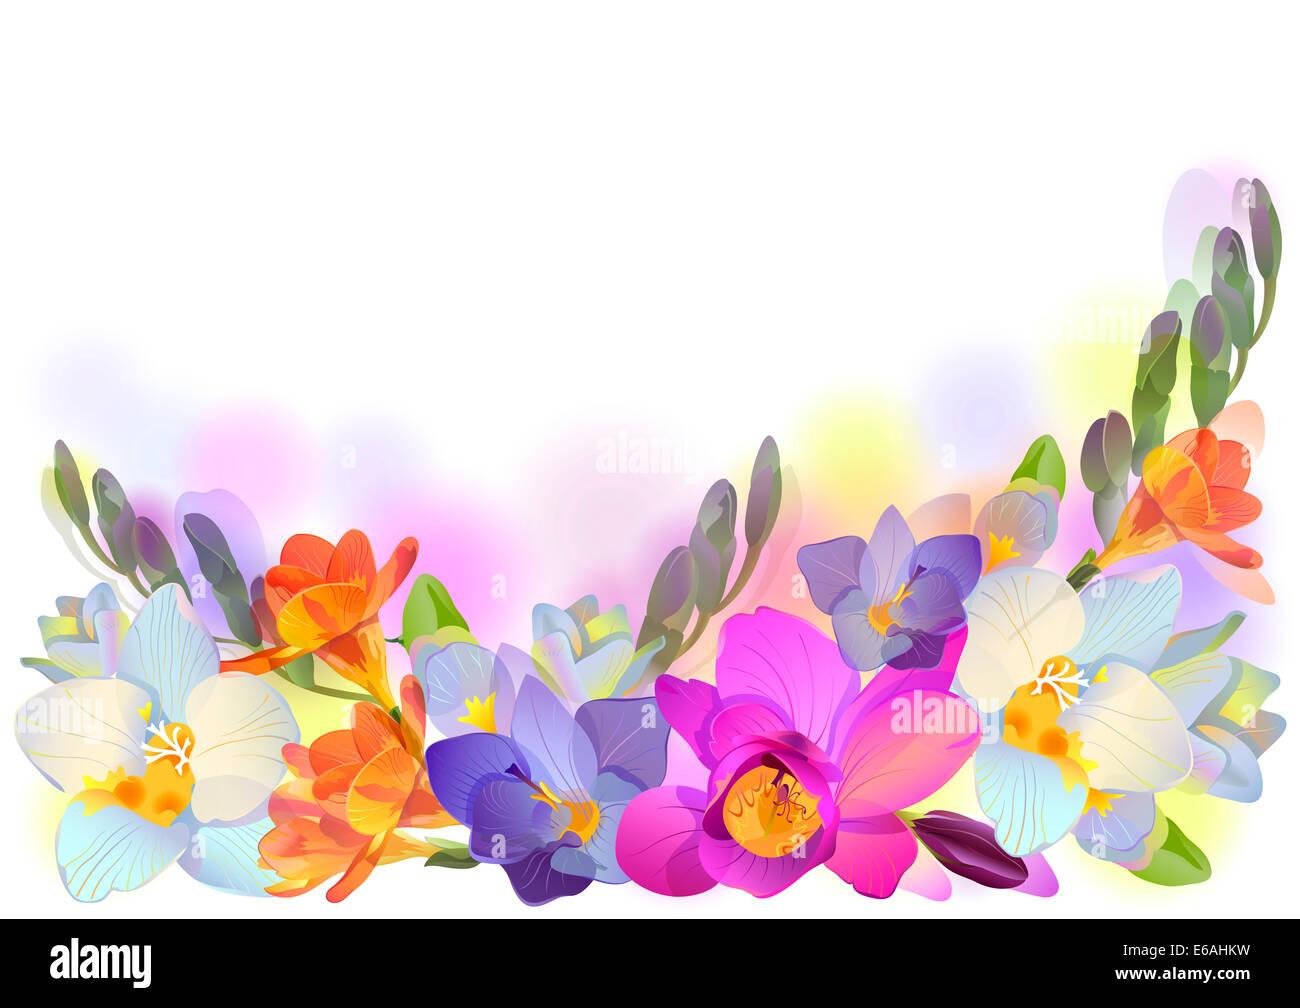 Freesia flower white background stock photos freesia flower white greeting background with pictorial freesia flowers in horizontal format stock image mightylinksfo